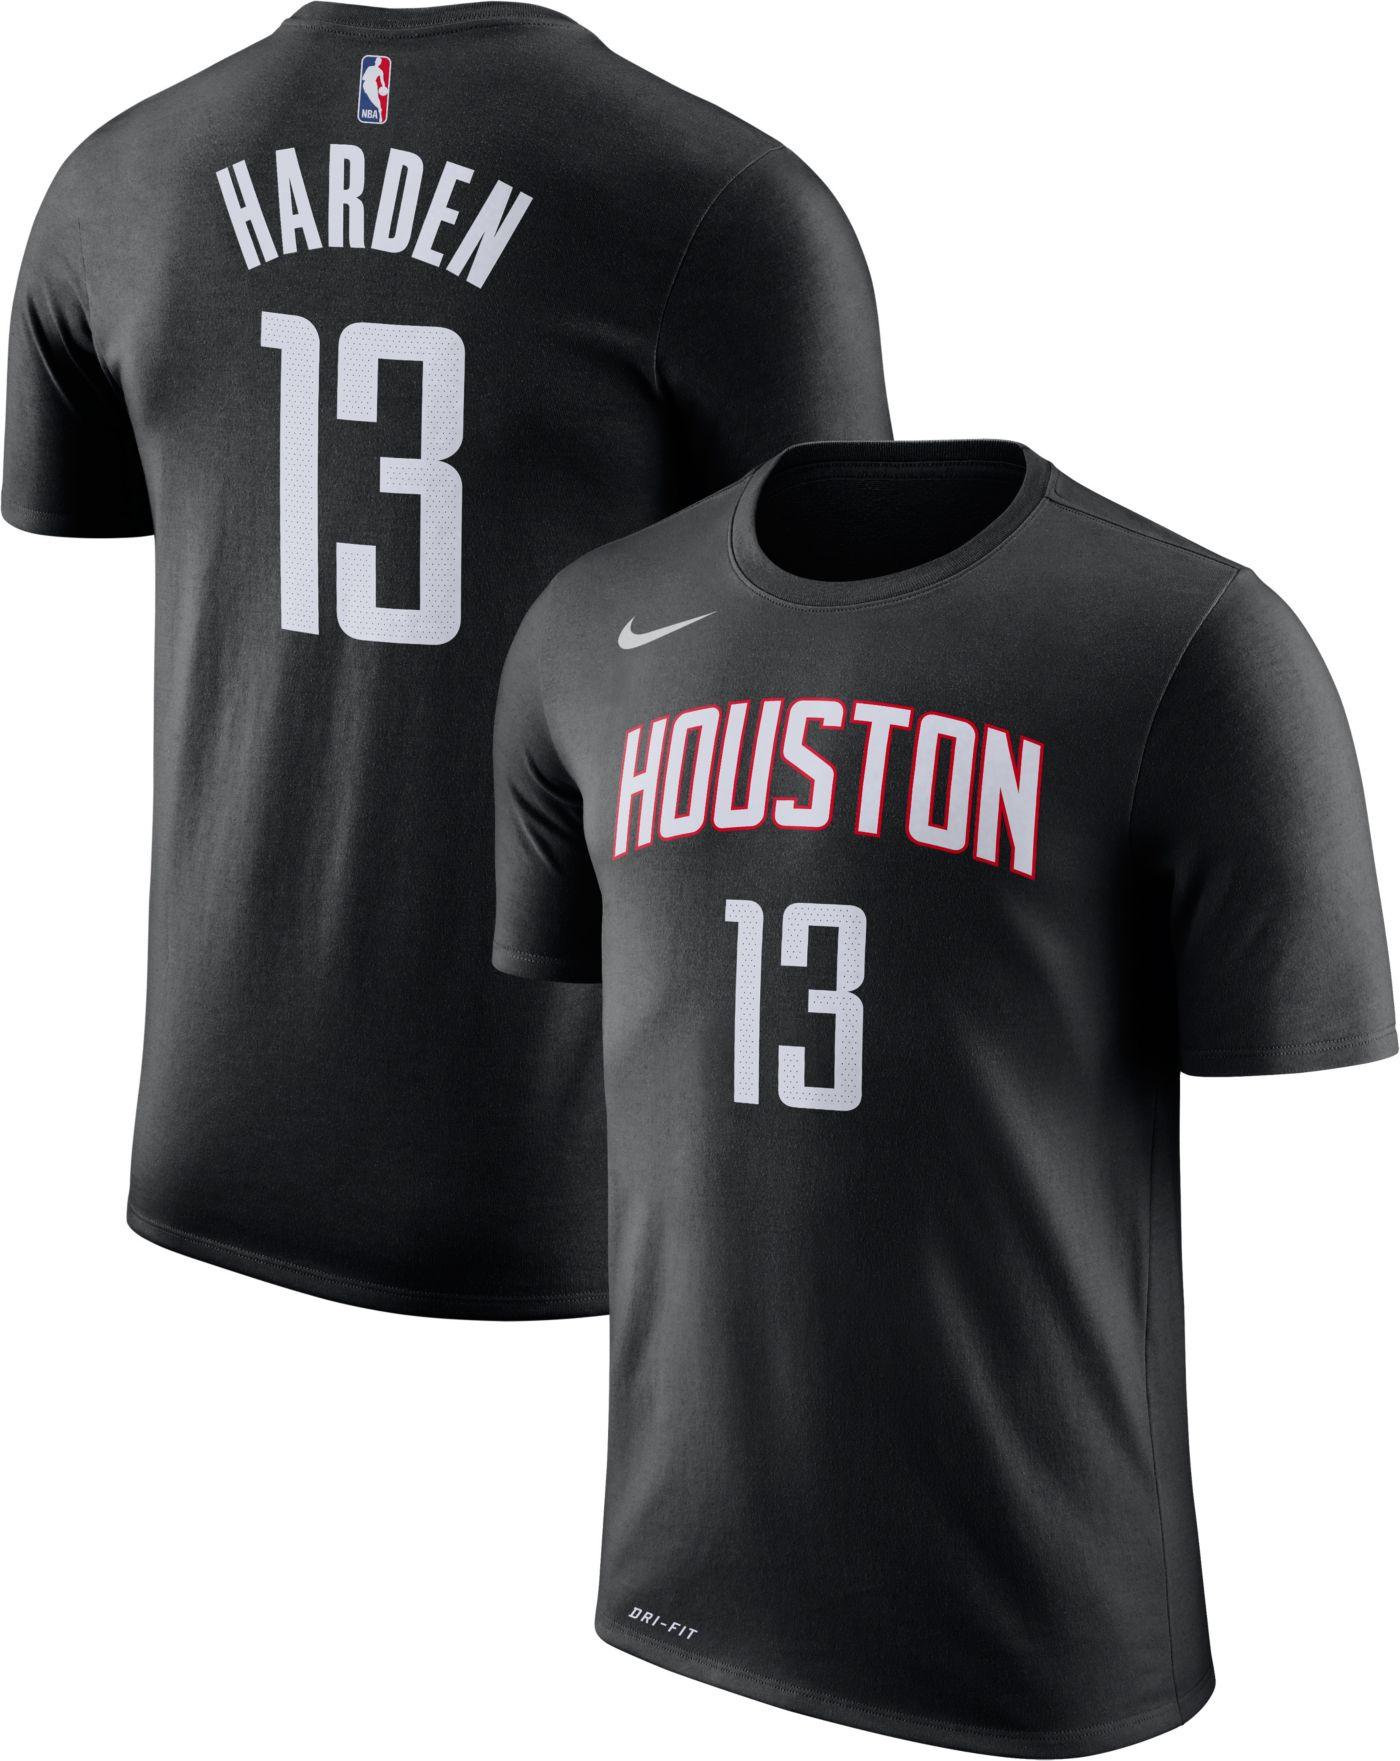 Nike Youth Houston Rockets James Harden #13 Dri-FIT Black T-Shirt